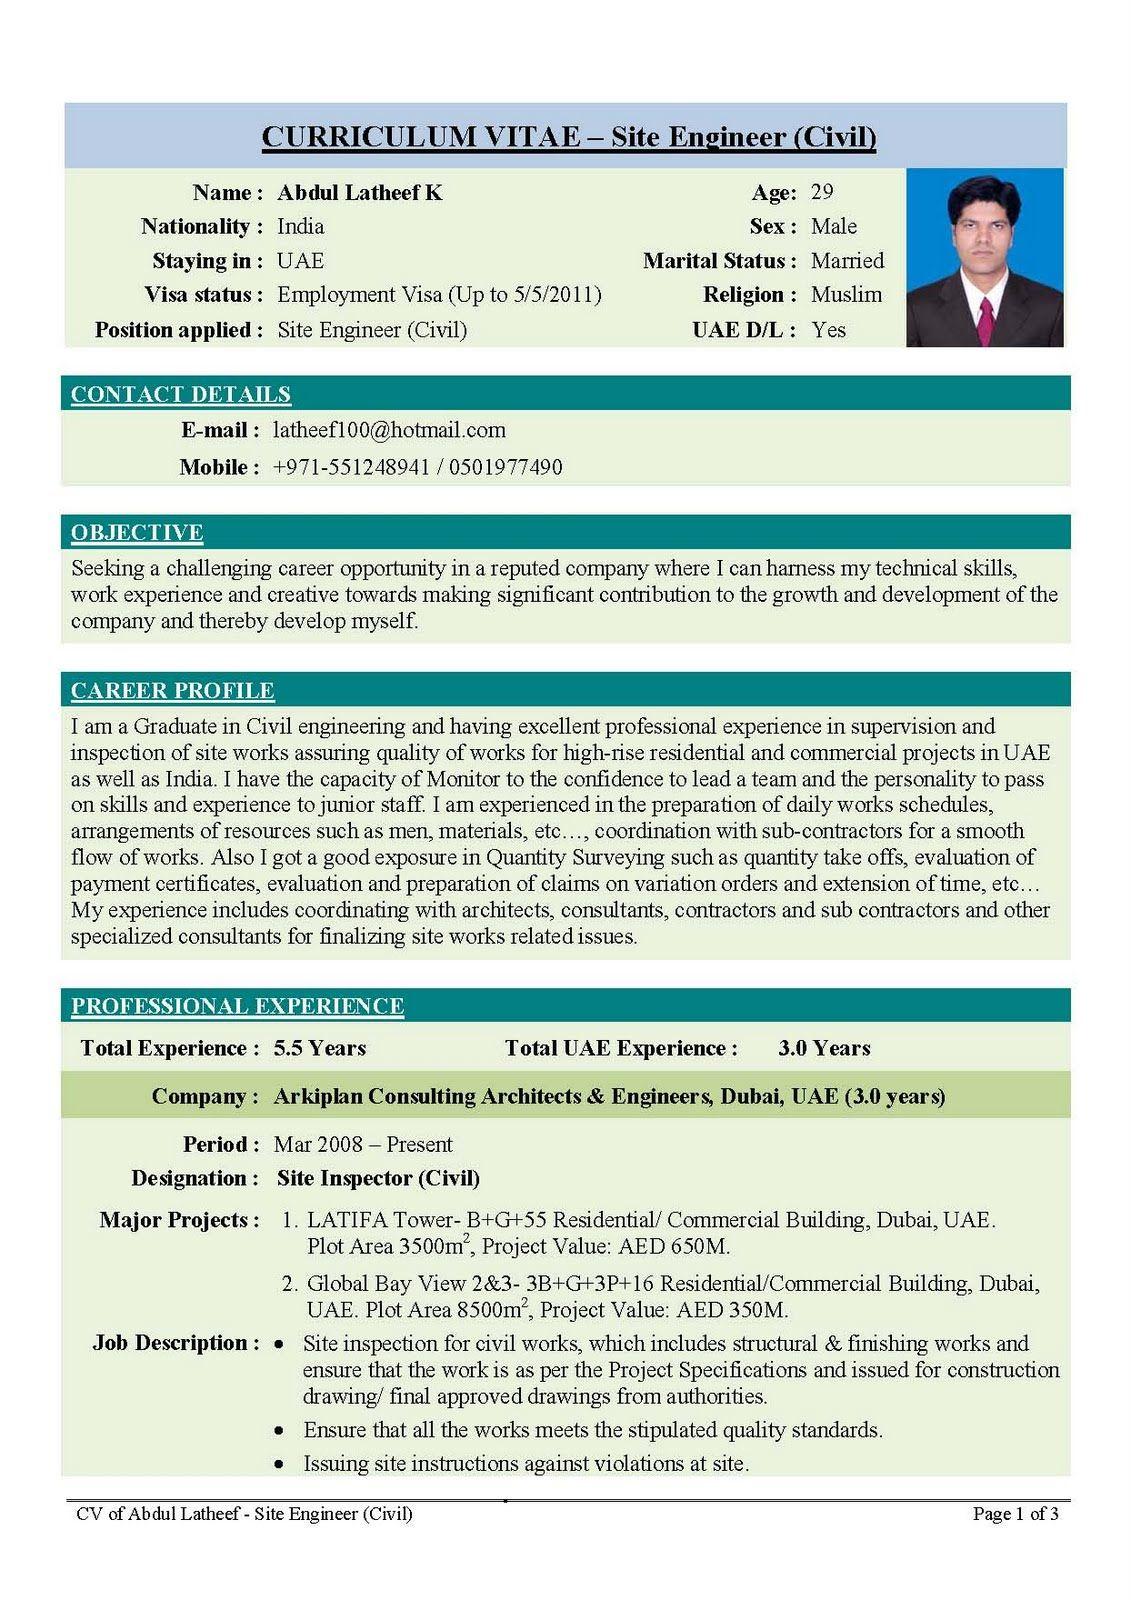 Civil Engineer Resume Sample - http://www.resumecareer.info/civil ...